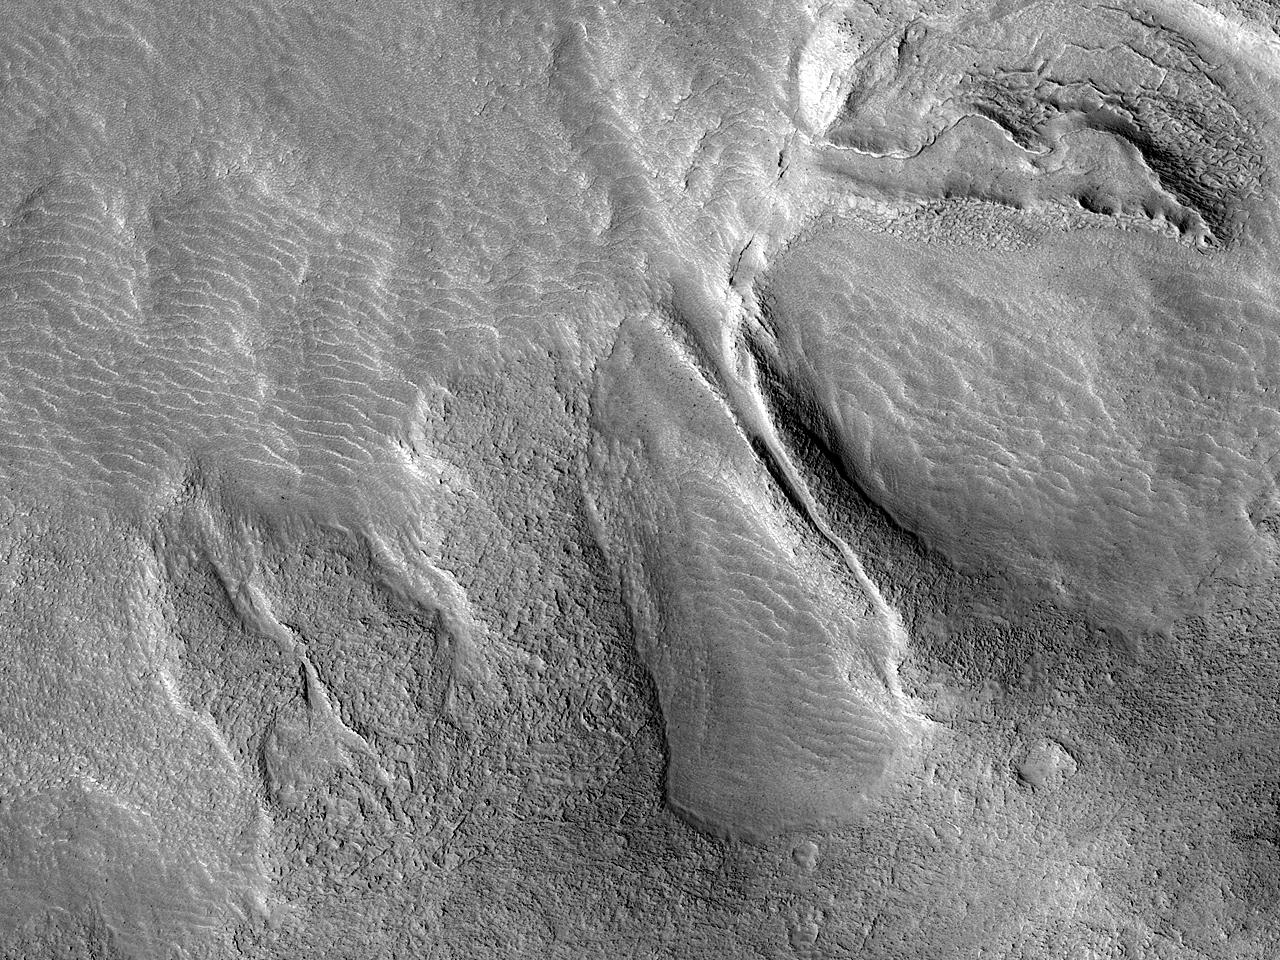 Strøm langs et platå i Protonilus Mensae